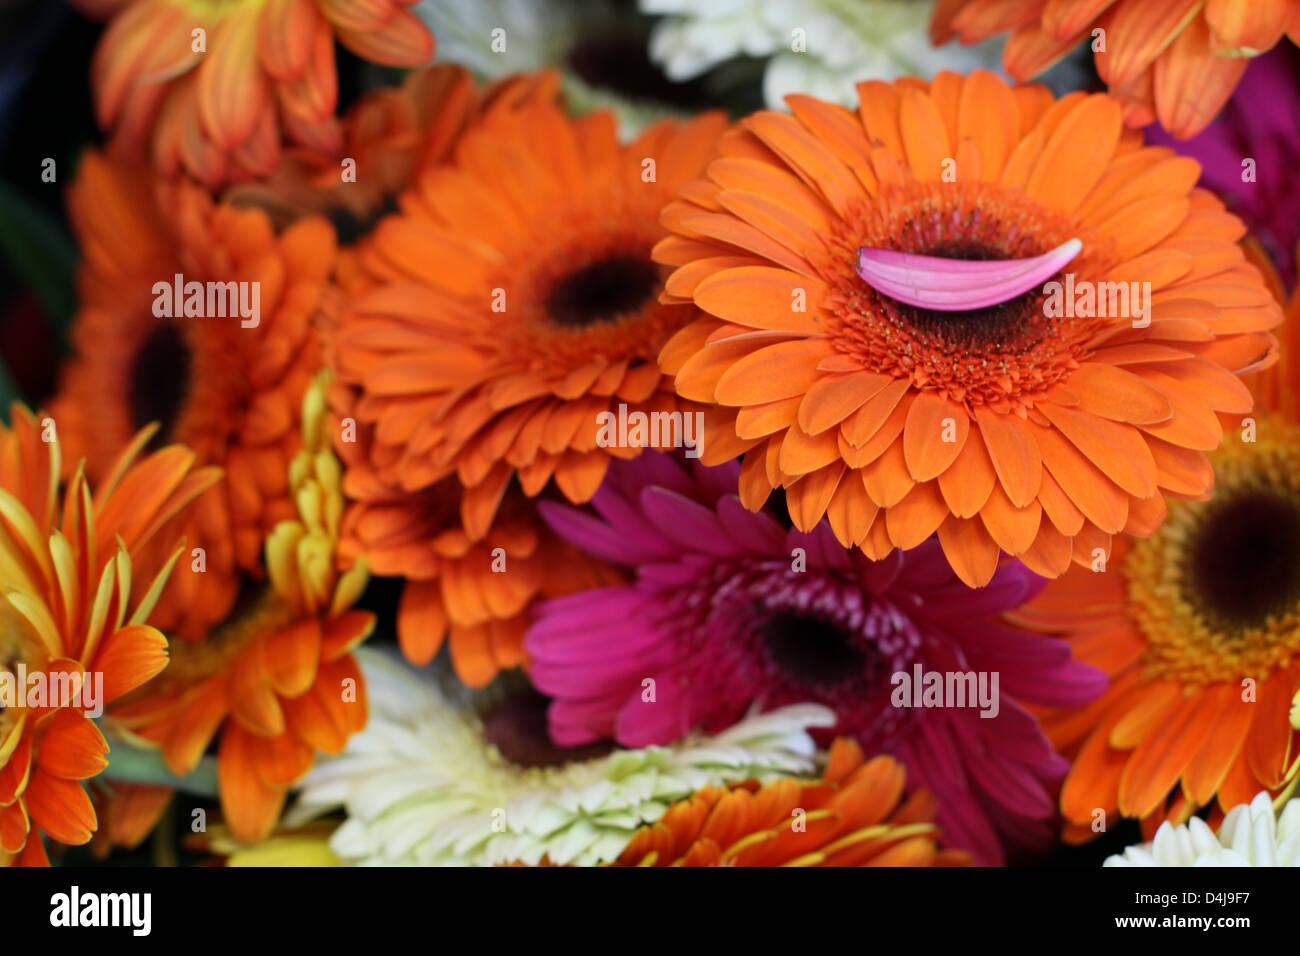 Fall Flowers Bouquet Stock Photos Fall Flowers Bouquet Stock